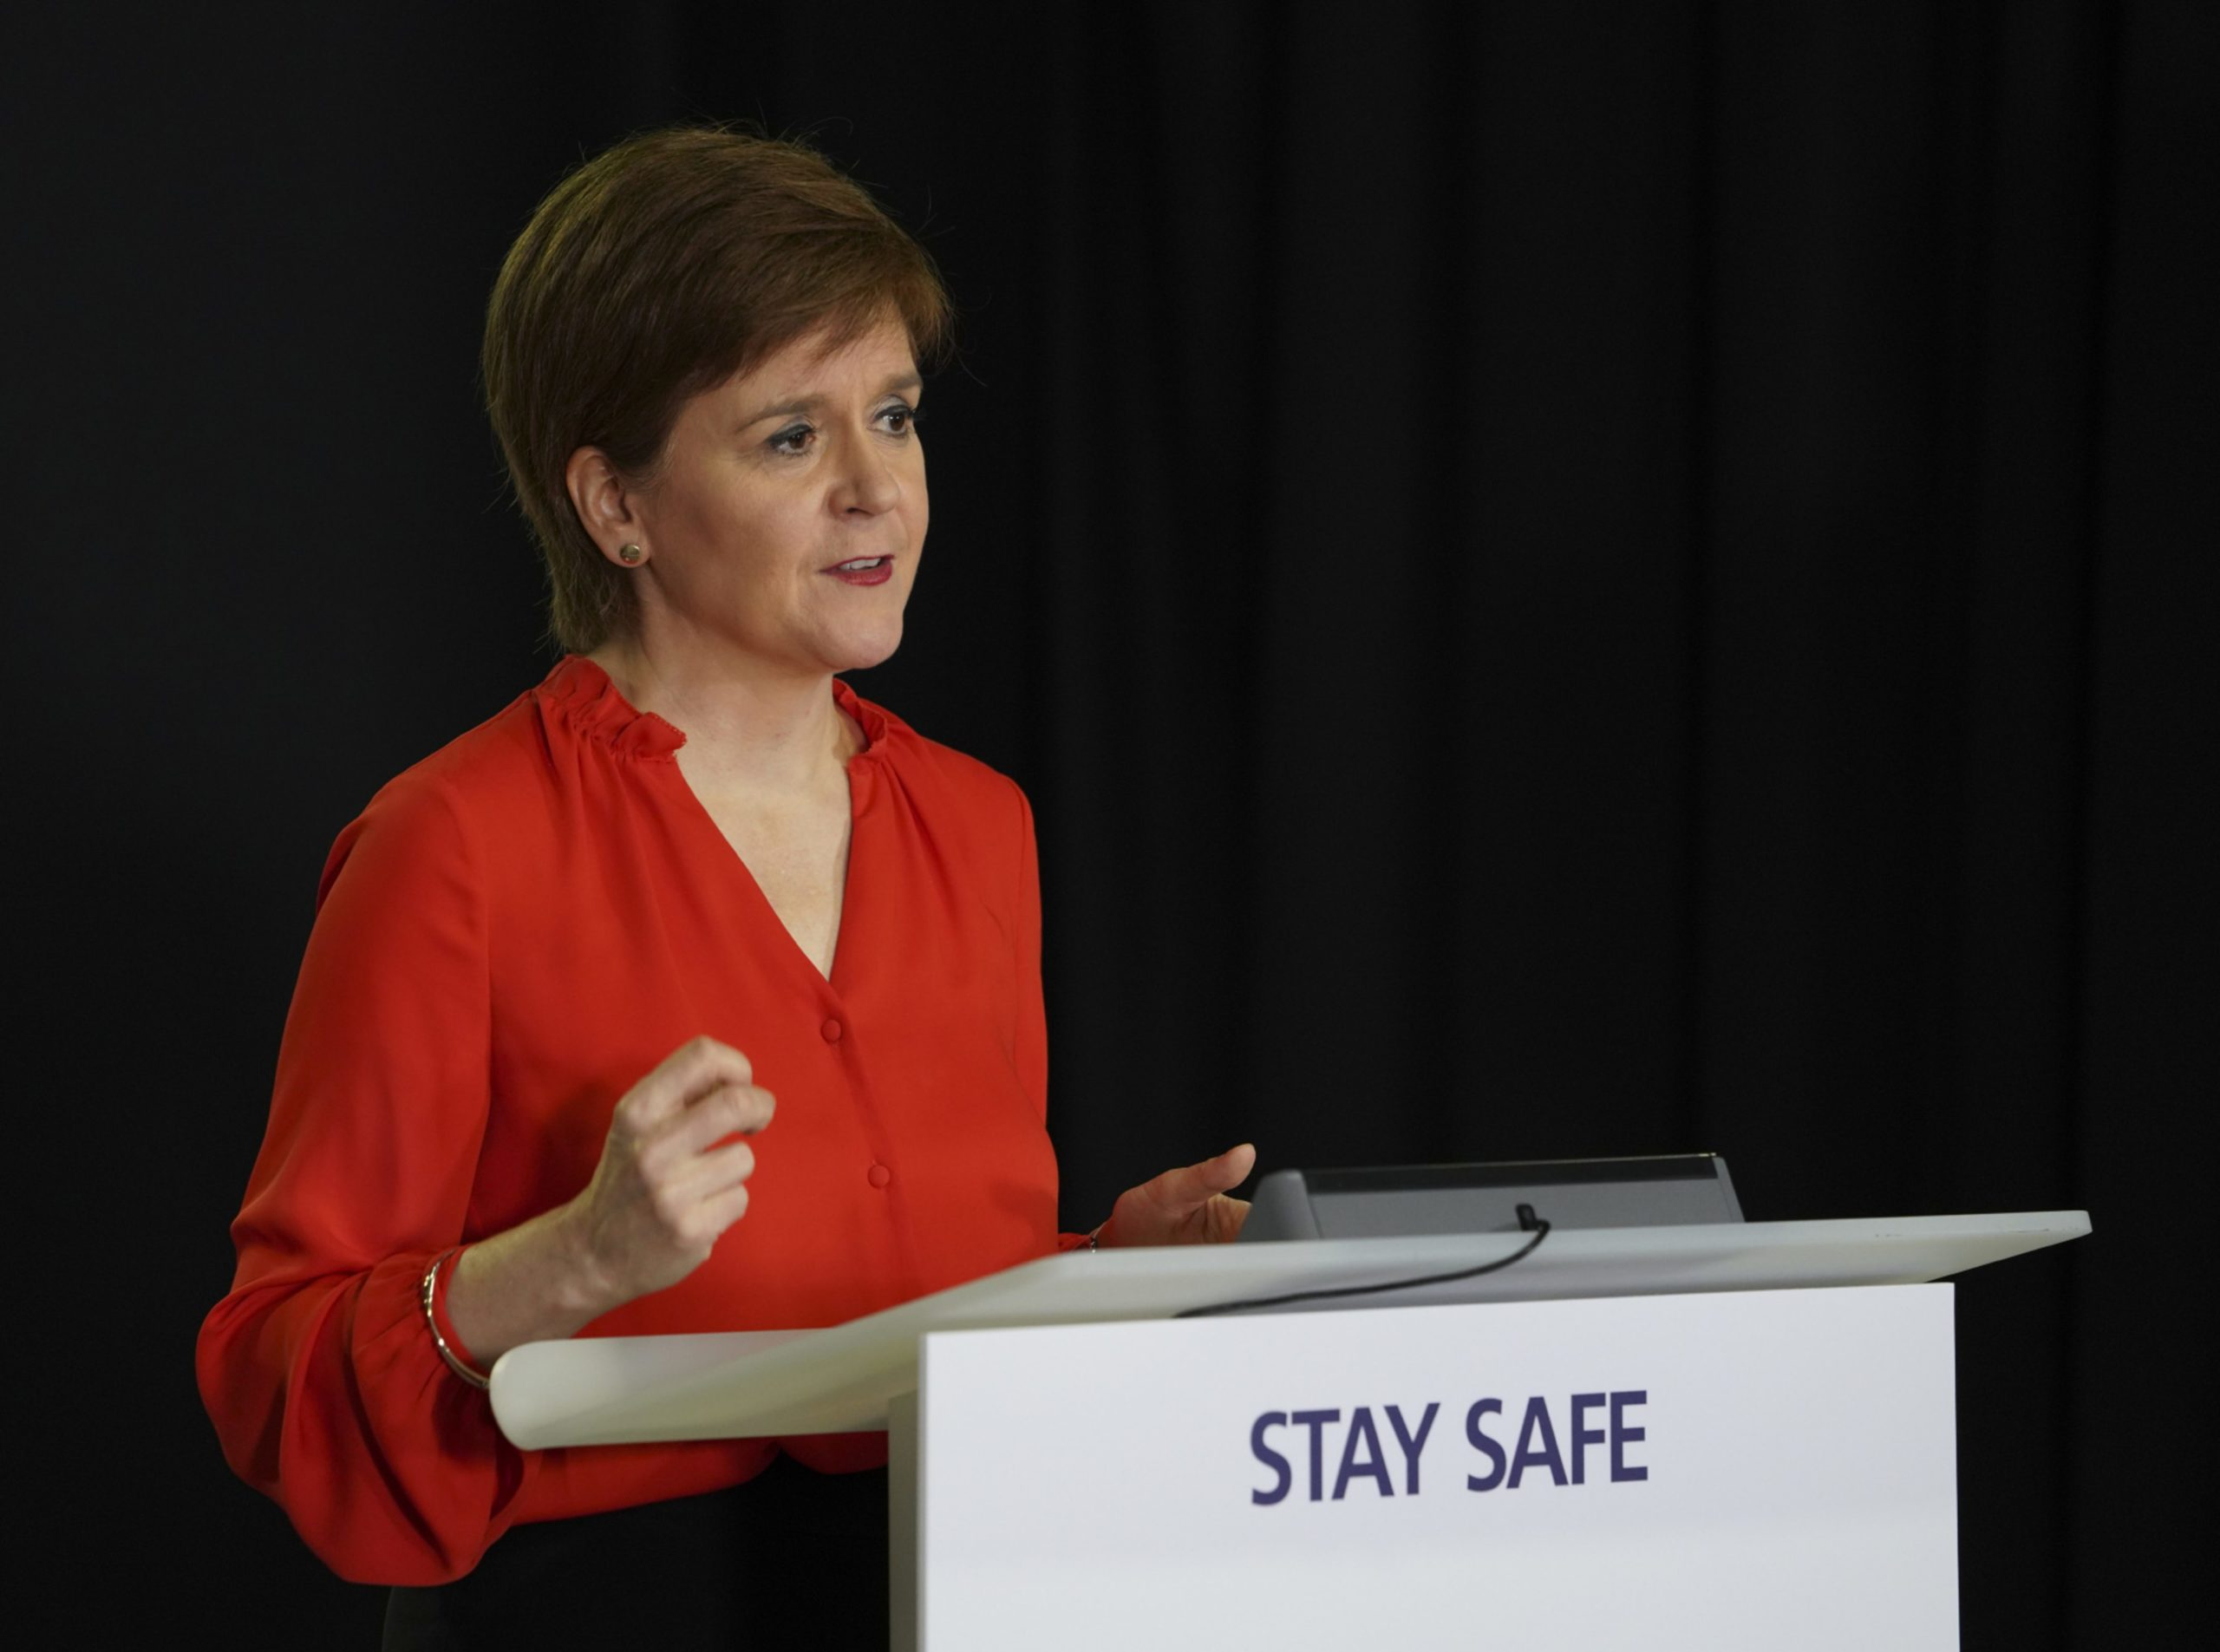 Nicola Sturgeon addressed exam results at her daily briefing in Edinburgh.